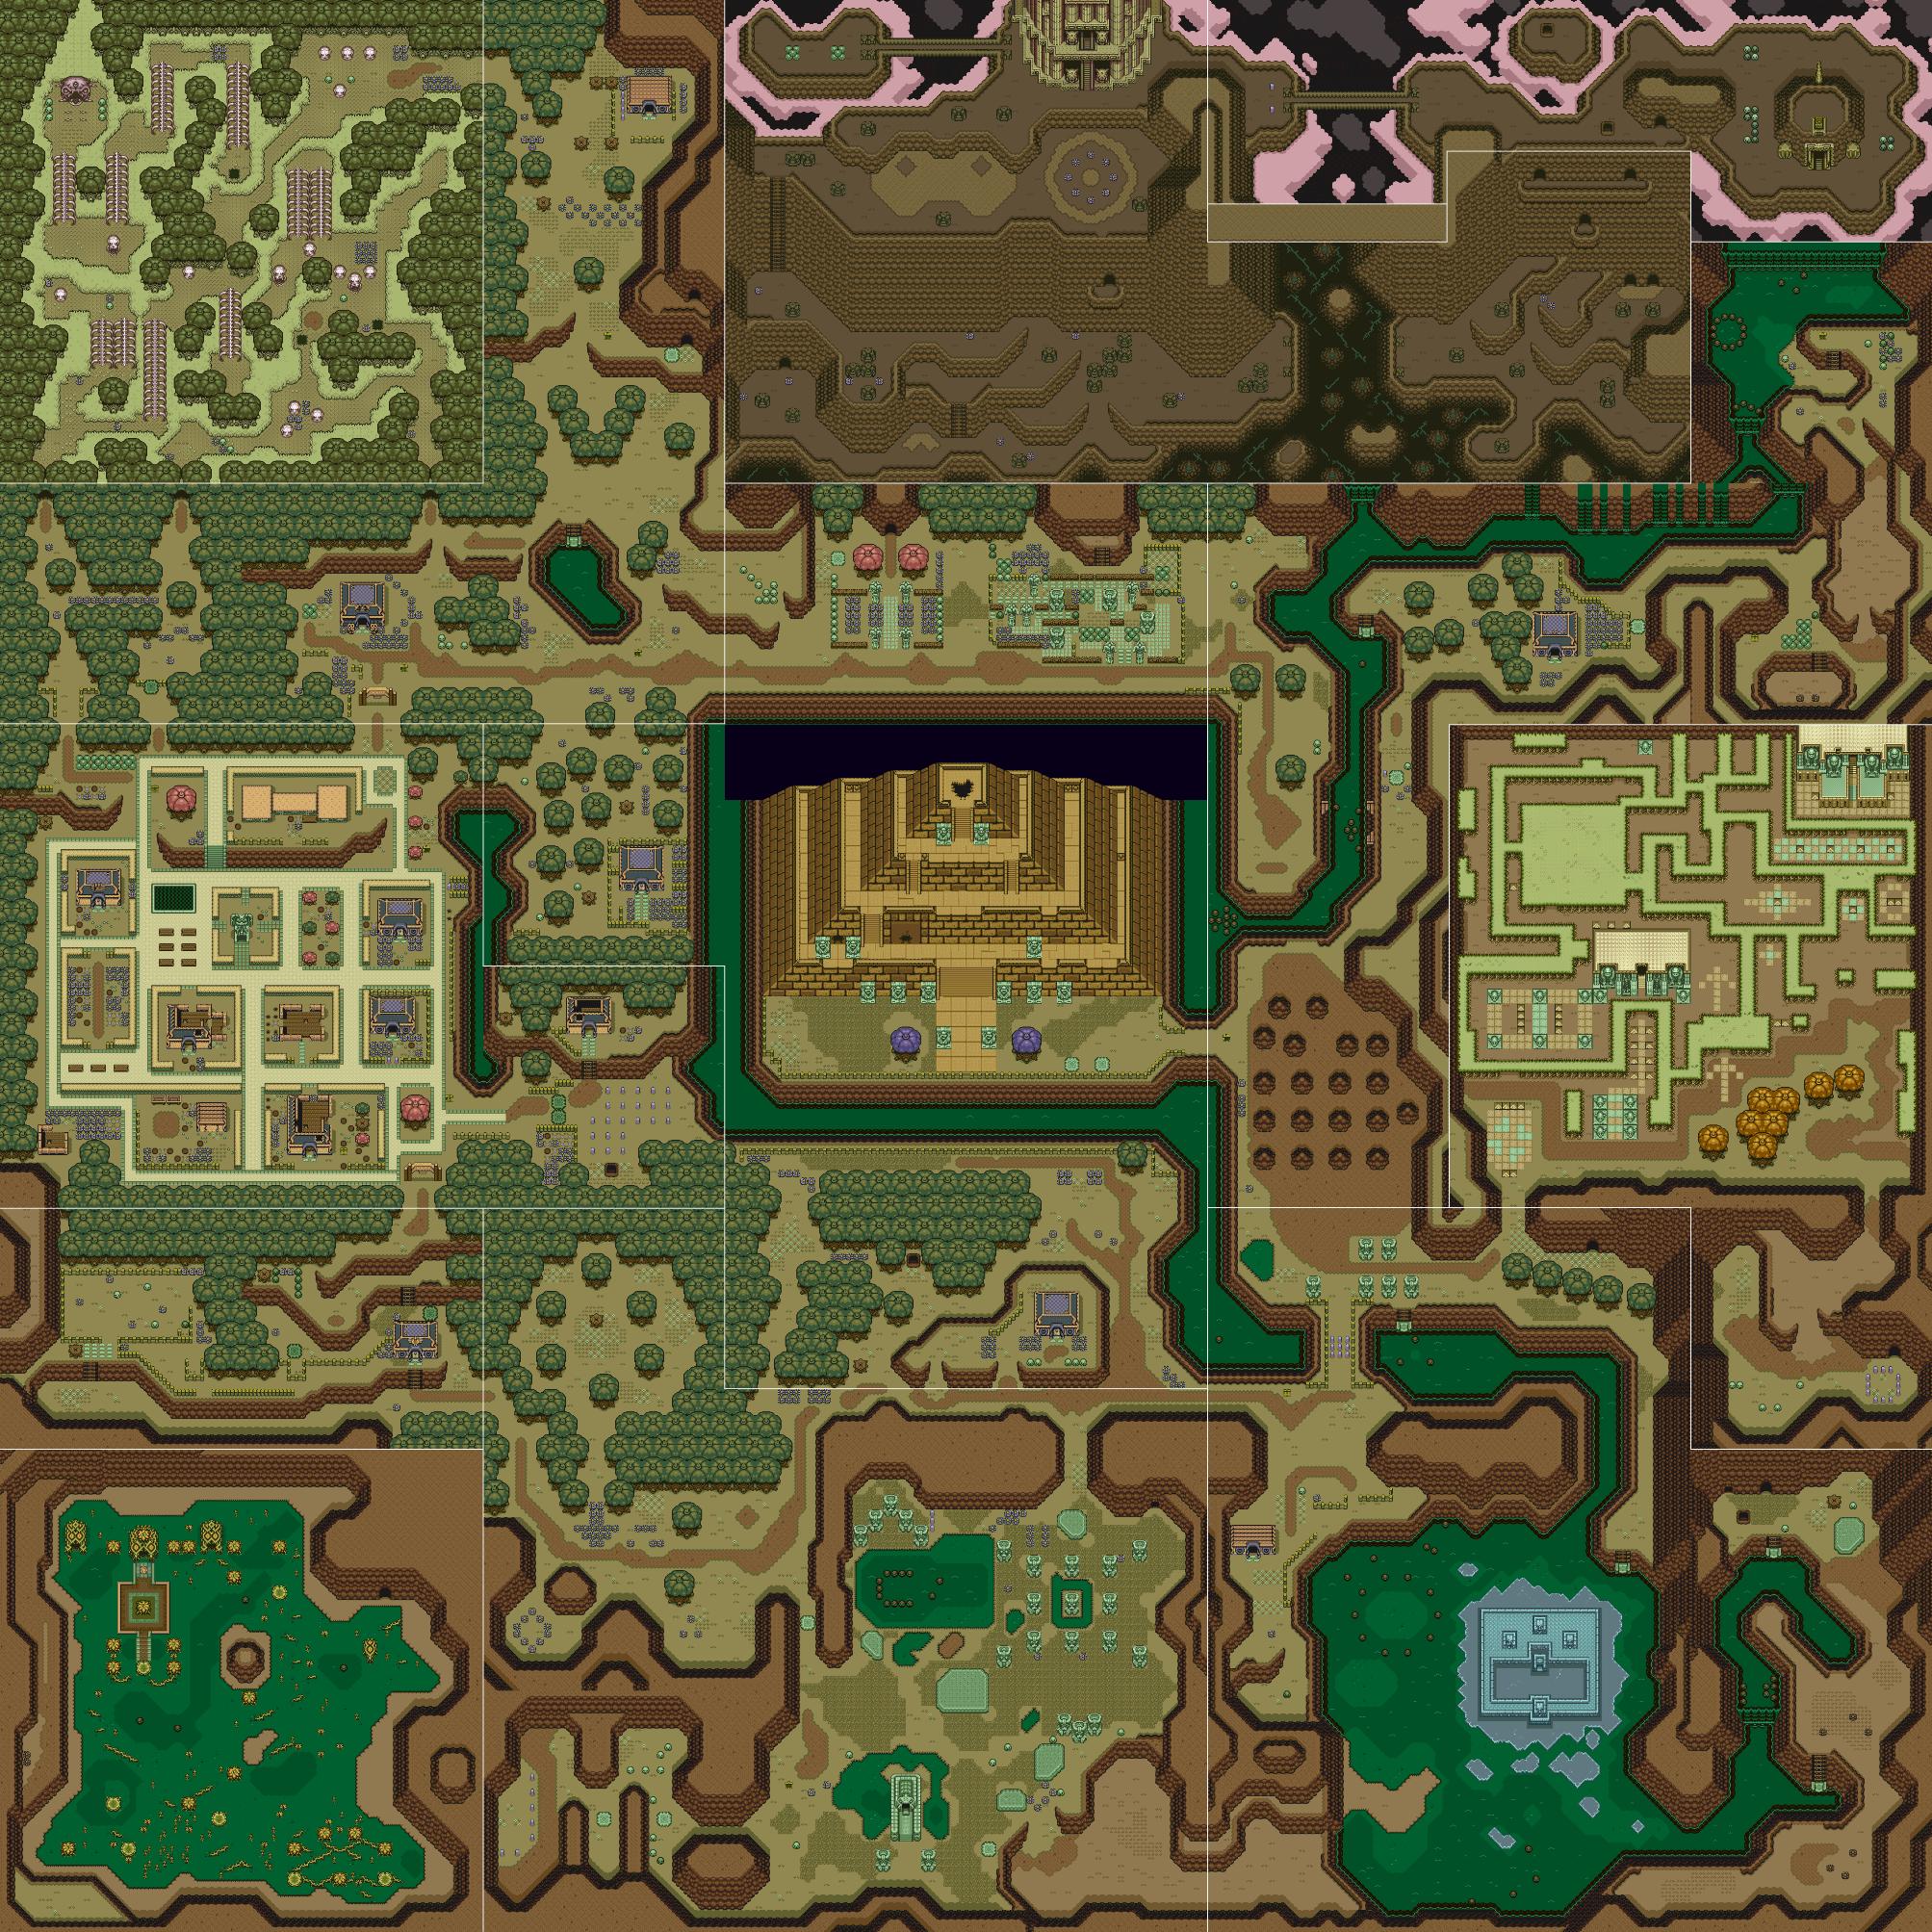 Dark World (A Link to the Past) | Zeldapedia | FANDOM powered by Wikia